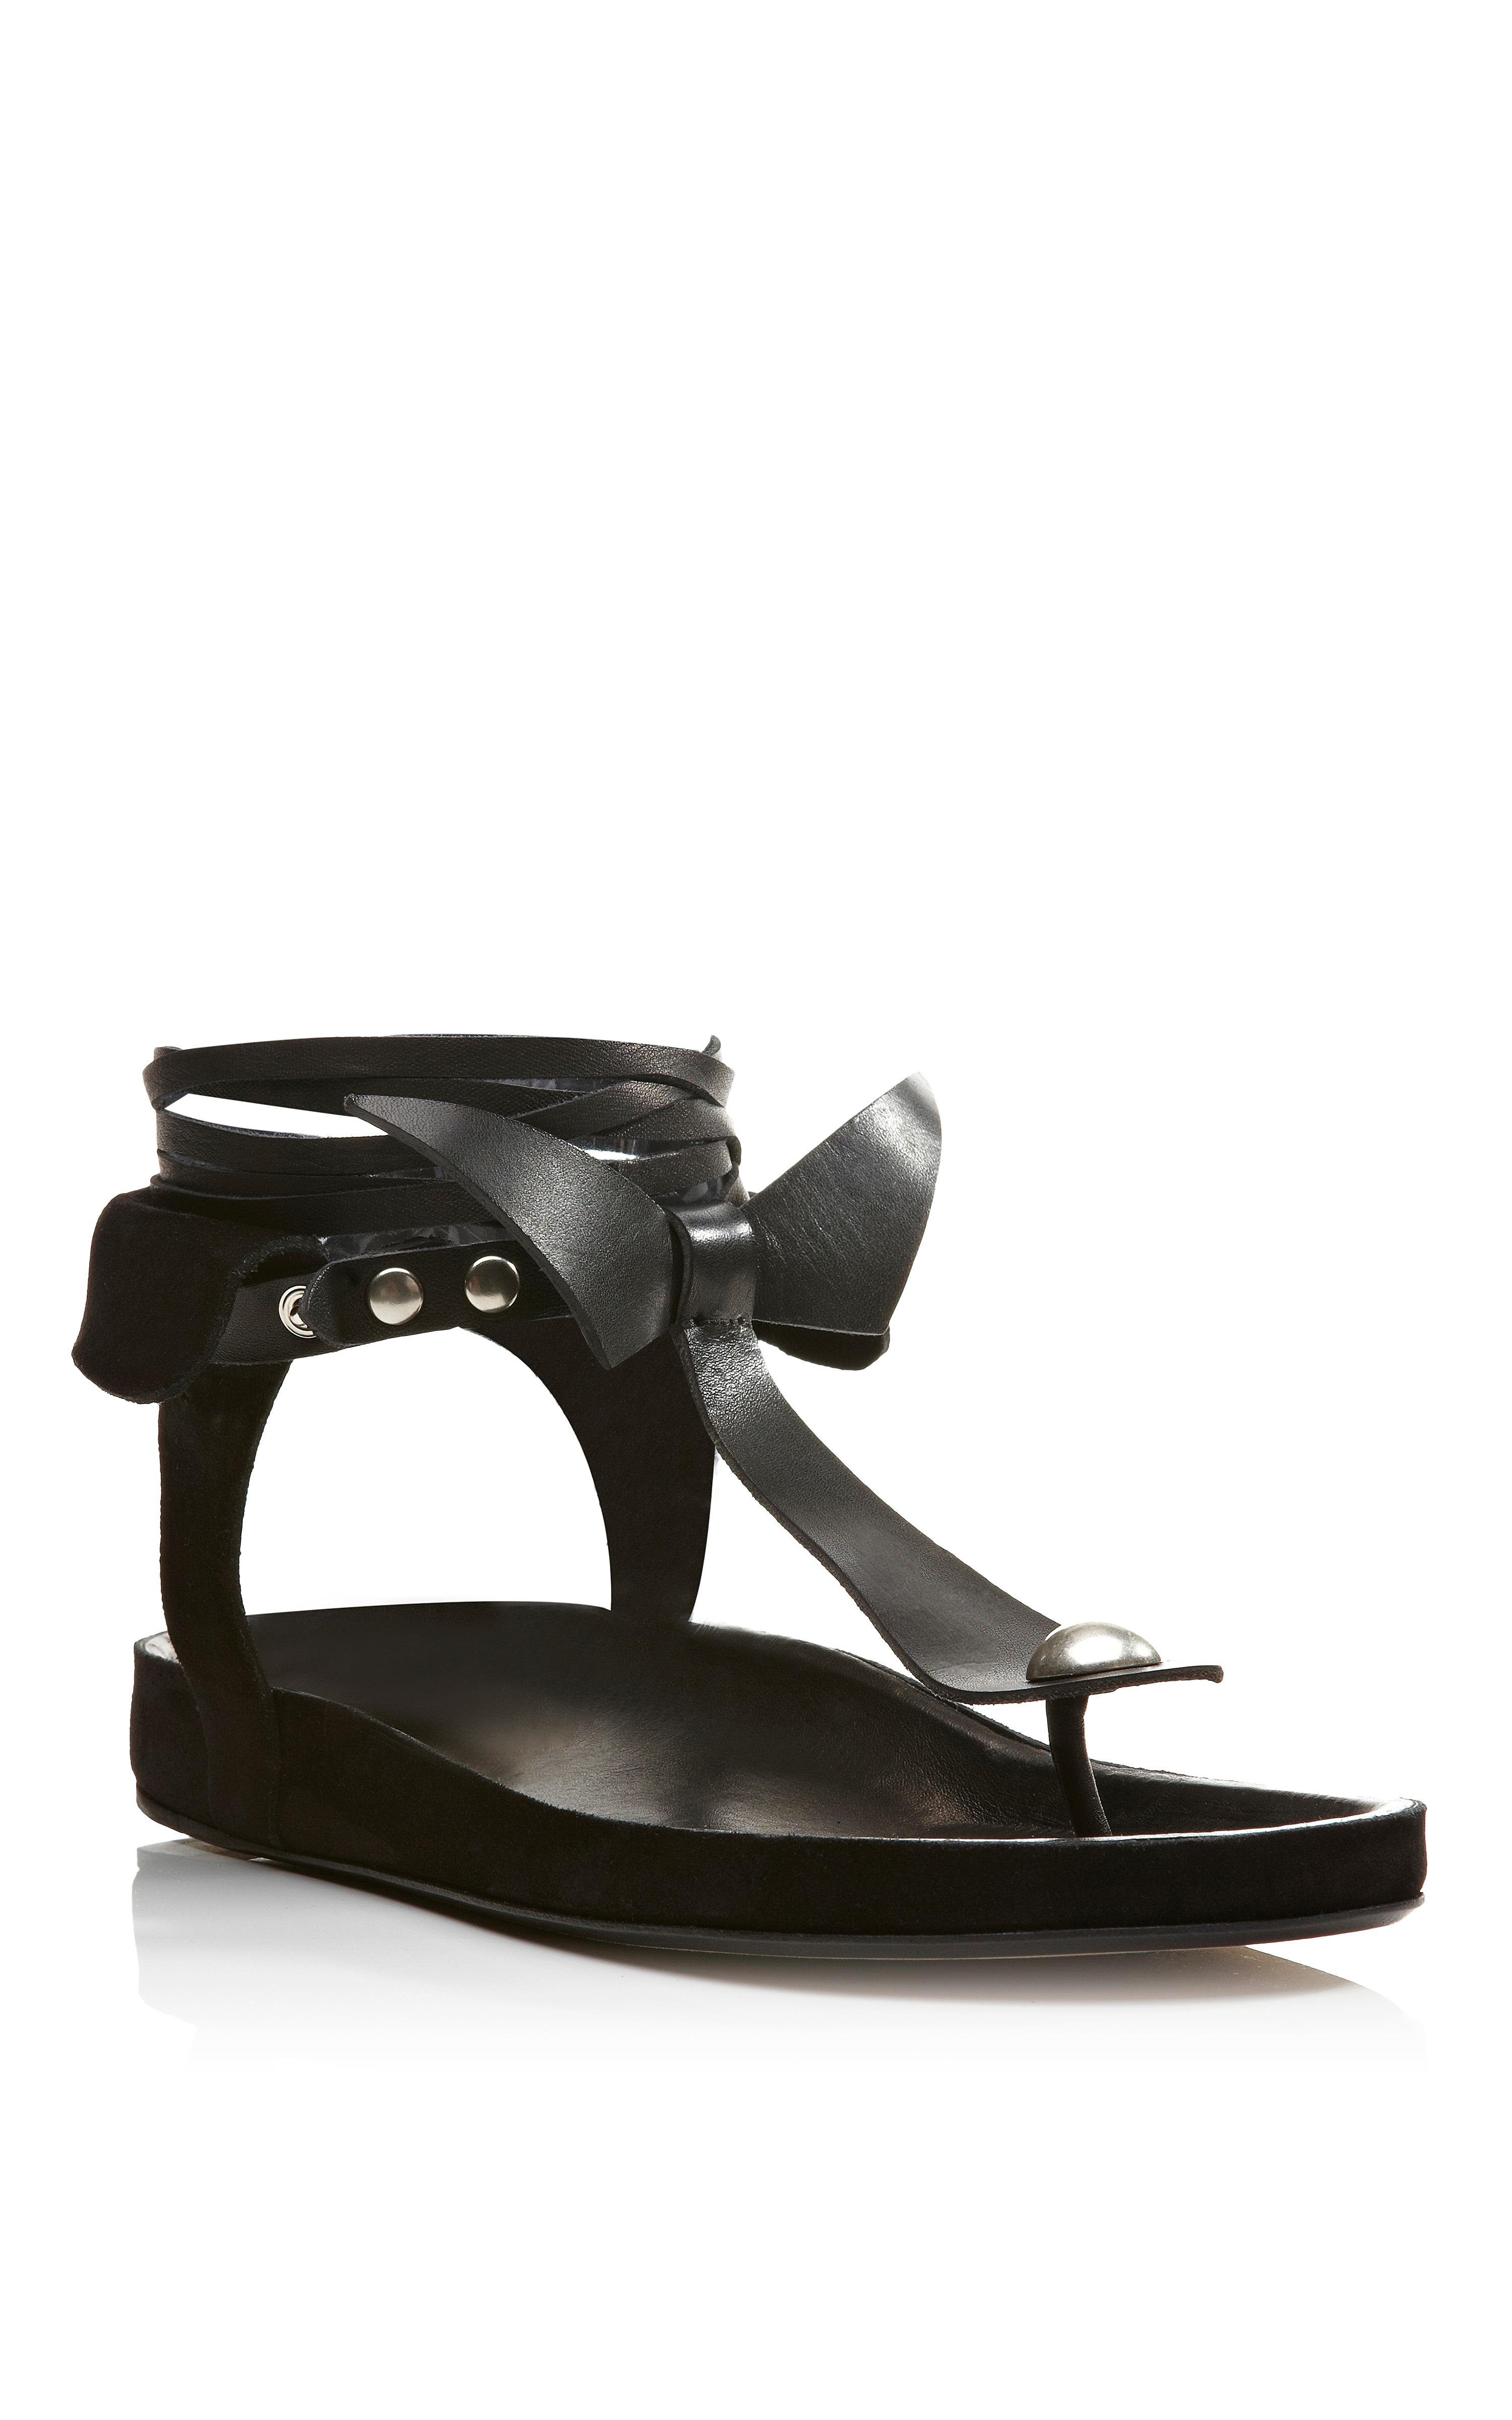 6cf309d8233f Lyst - Isabel Marant Elva Bow Tie Sandal in Black